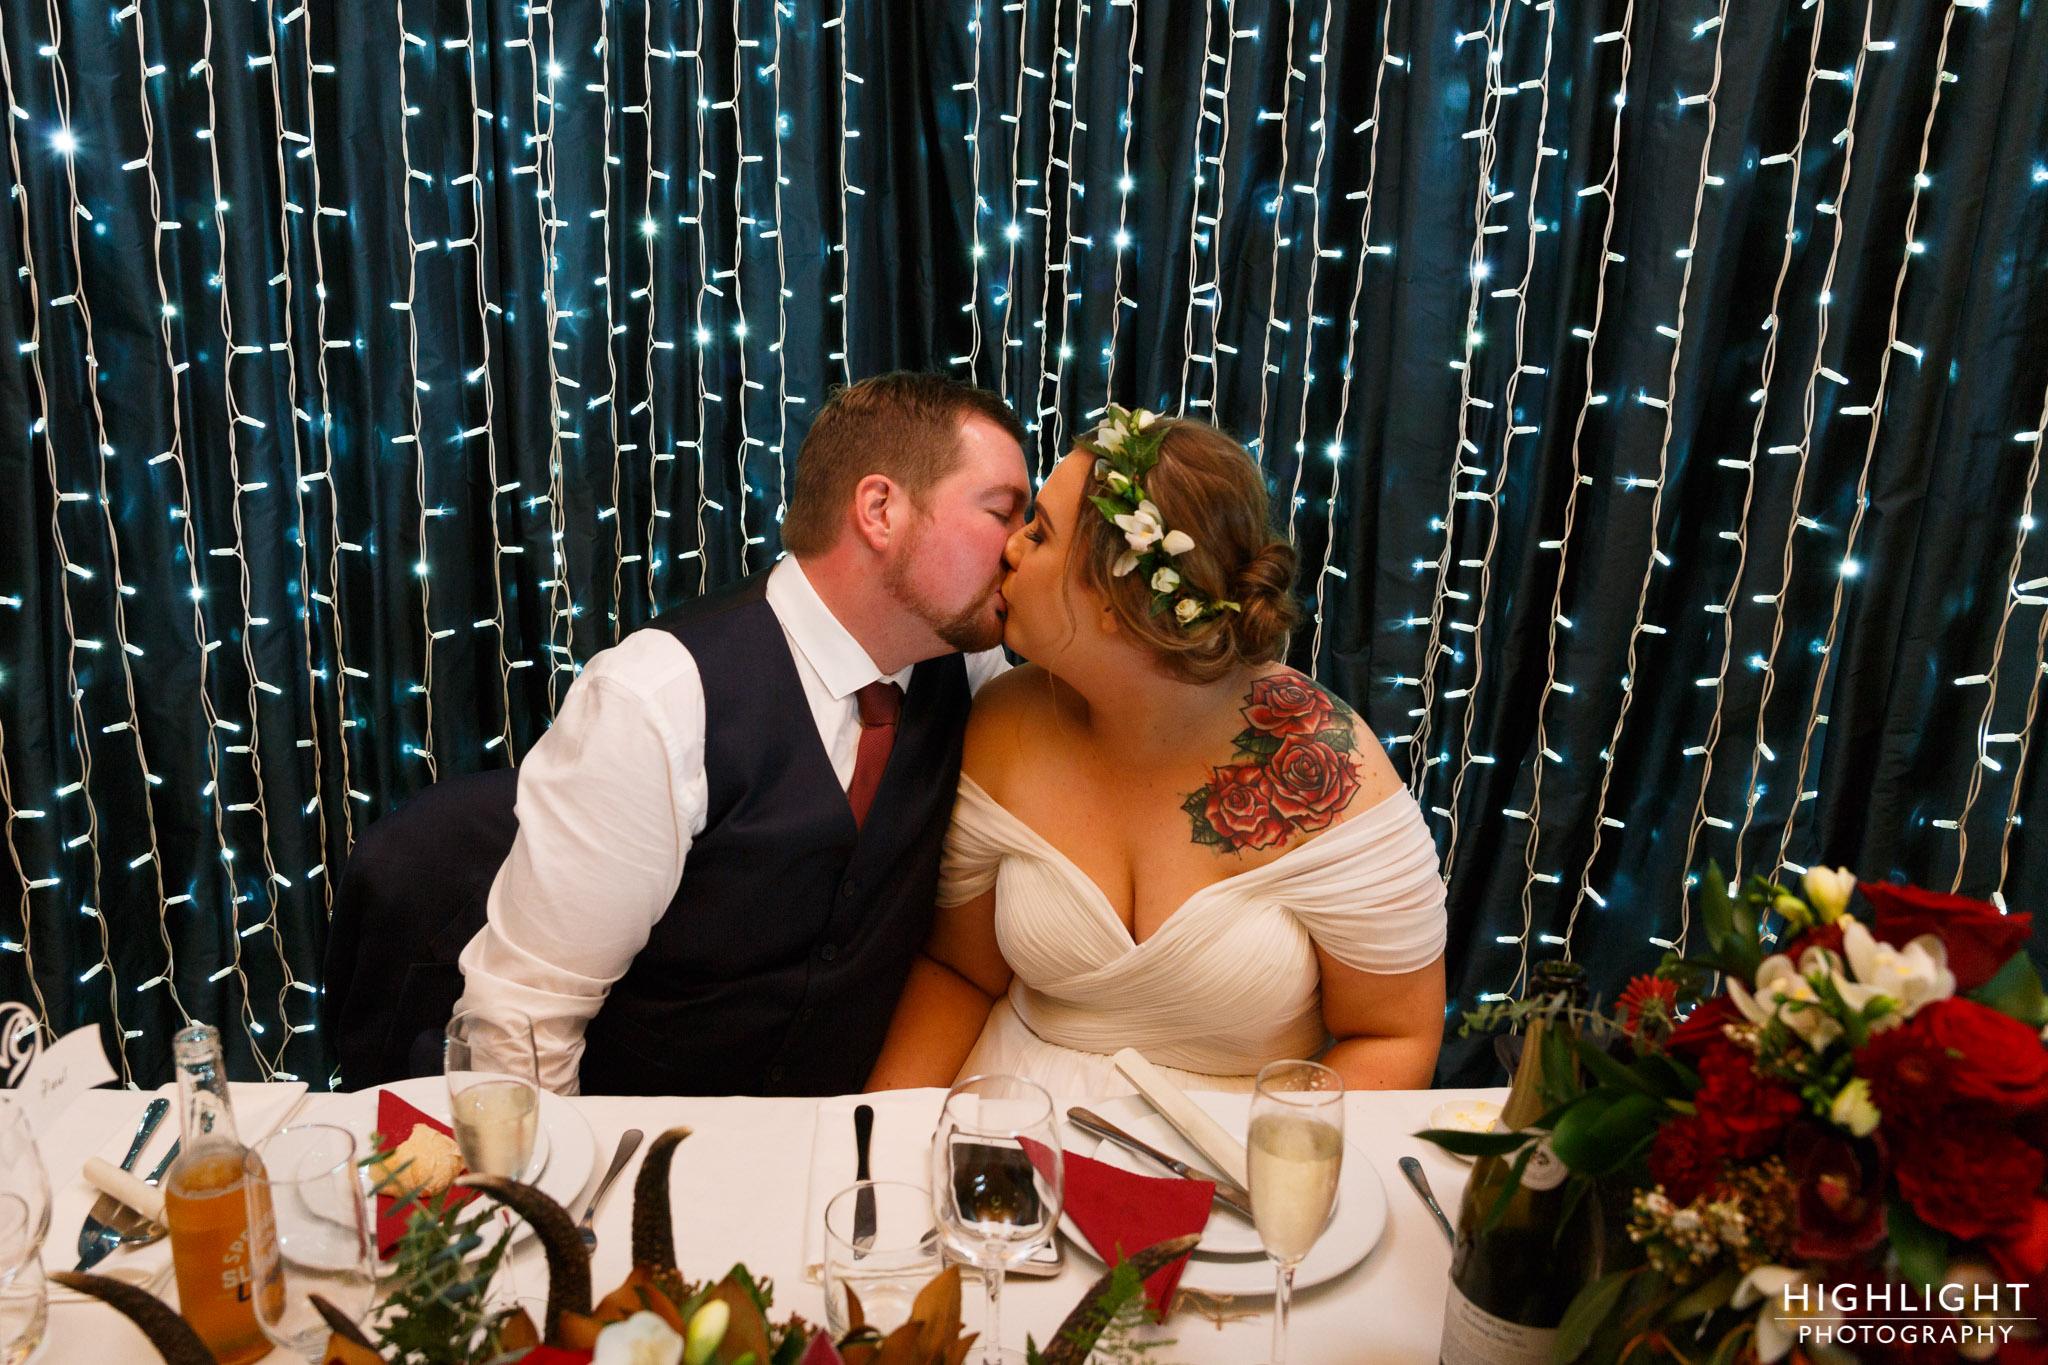 Highlight-wedding-photography-new-zealand-palmerston-north-120.jpg